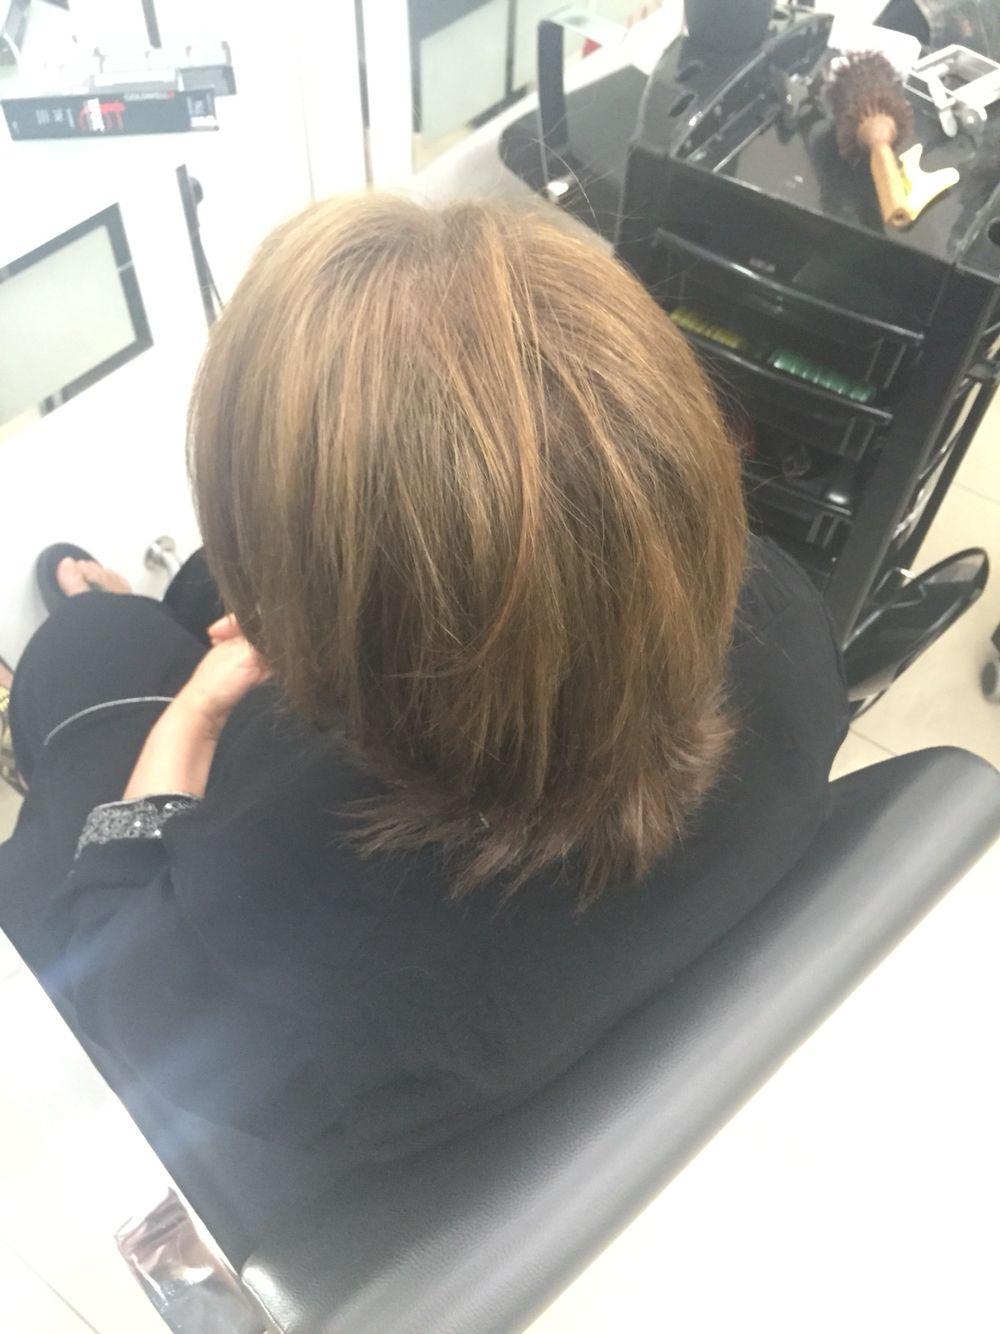 Hair colour image boy pin by mouna moumni on goldwell  pinterest  hair coloring